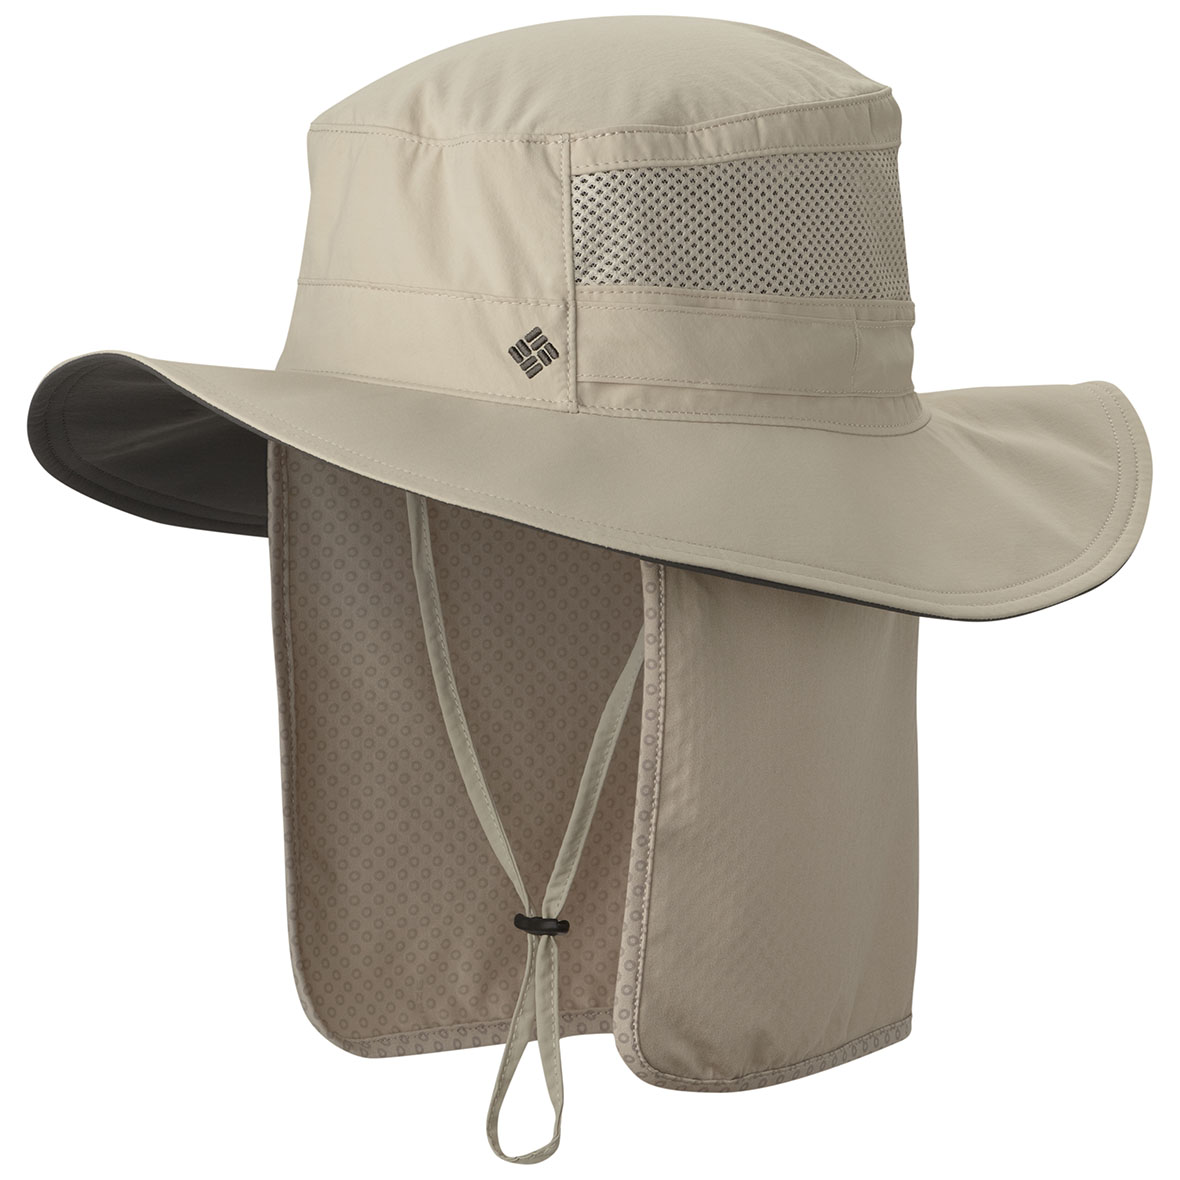 c6c39dce6f2 Columbia Men s Coolhead™ Zero Booney Hat